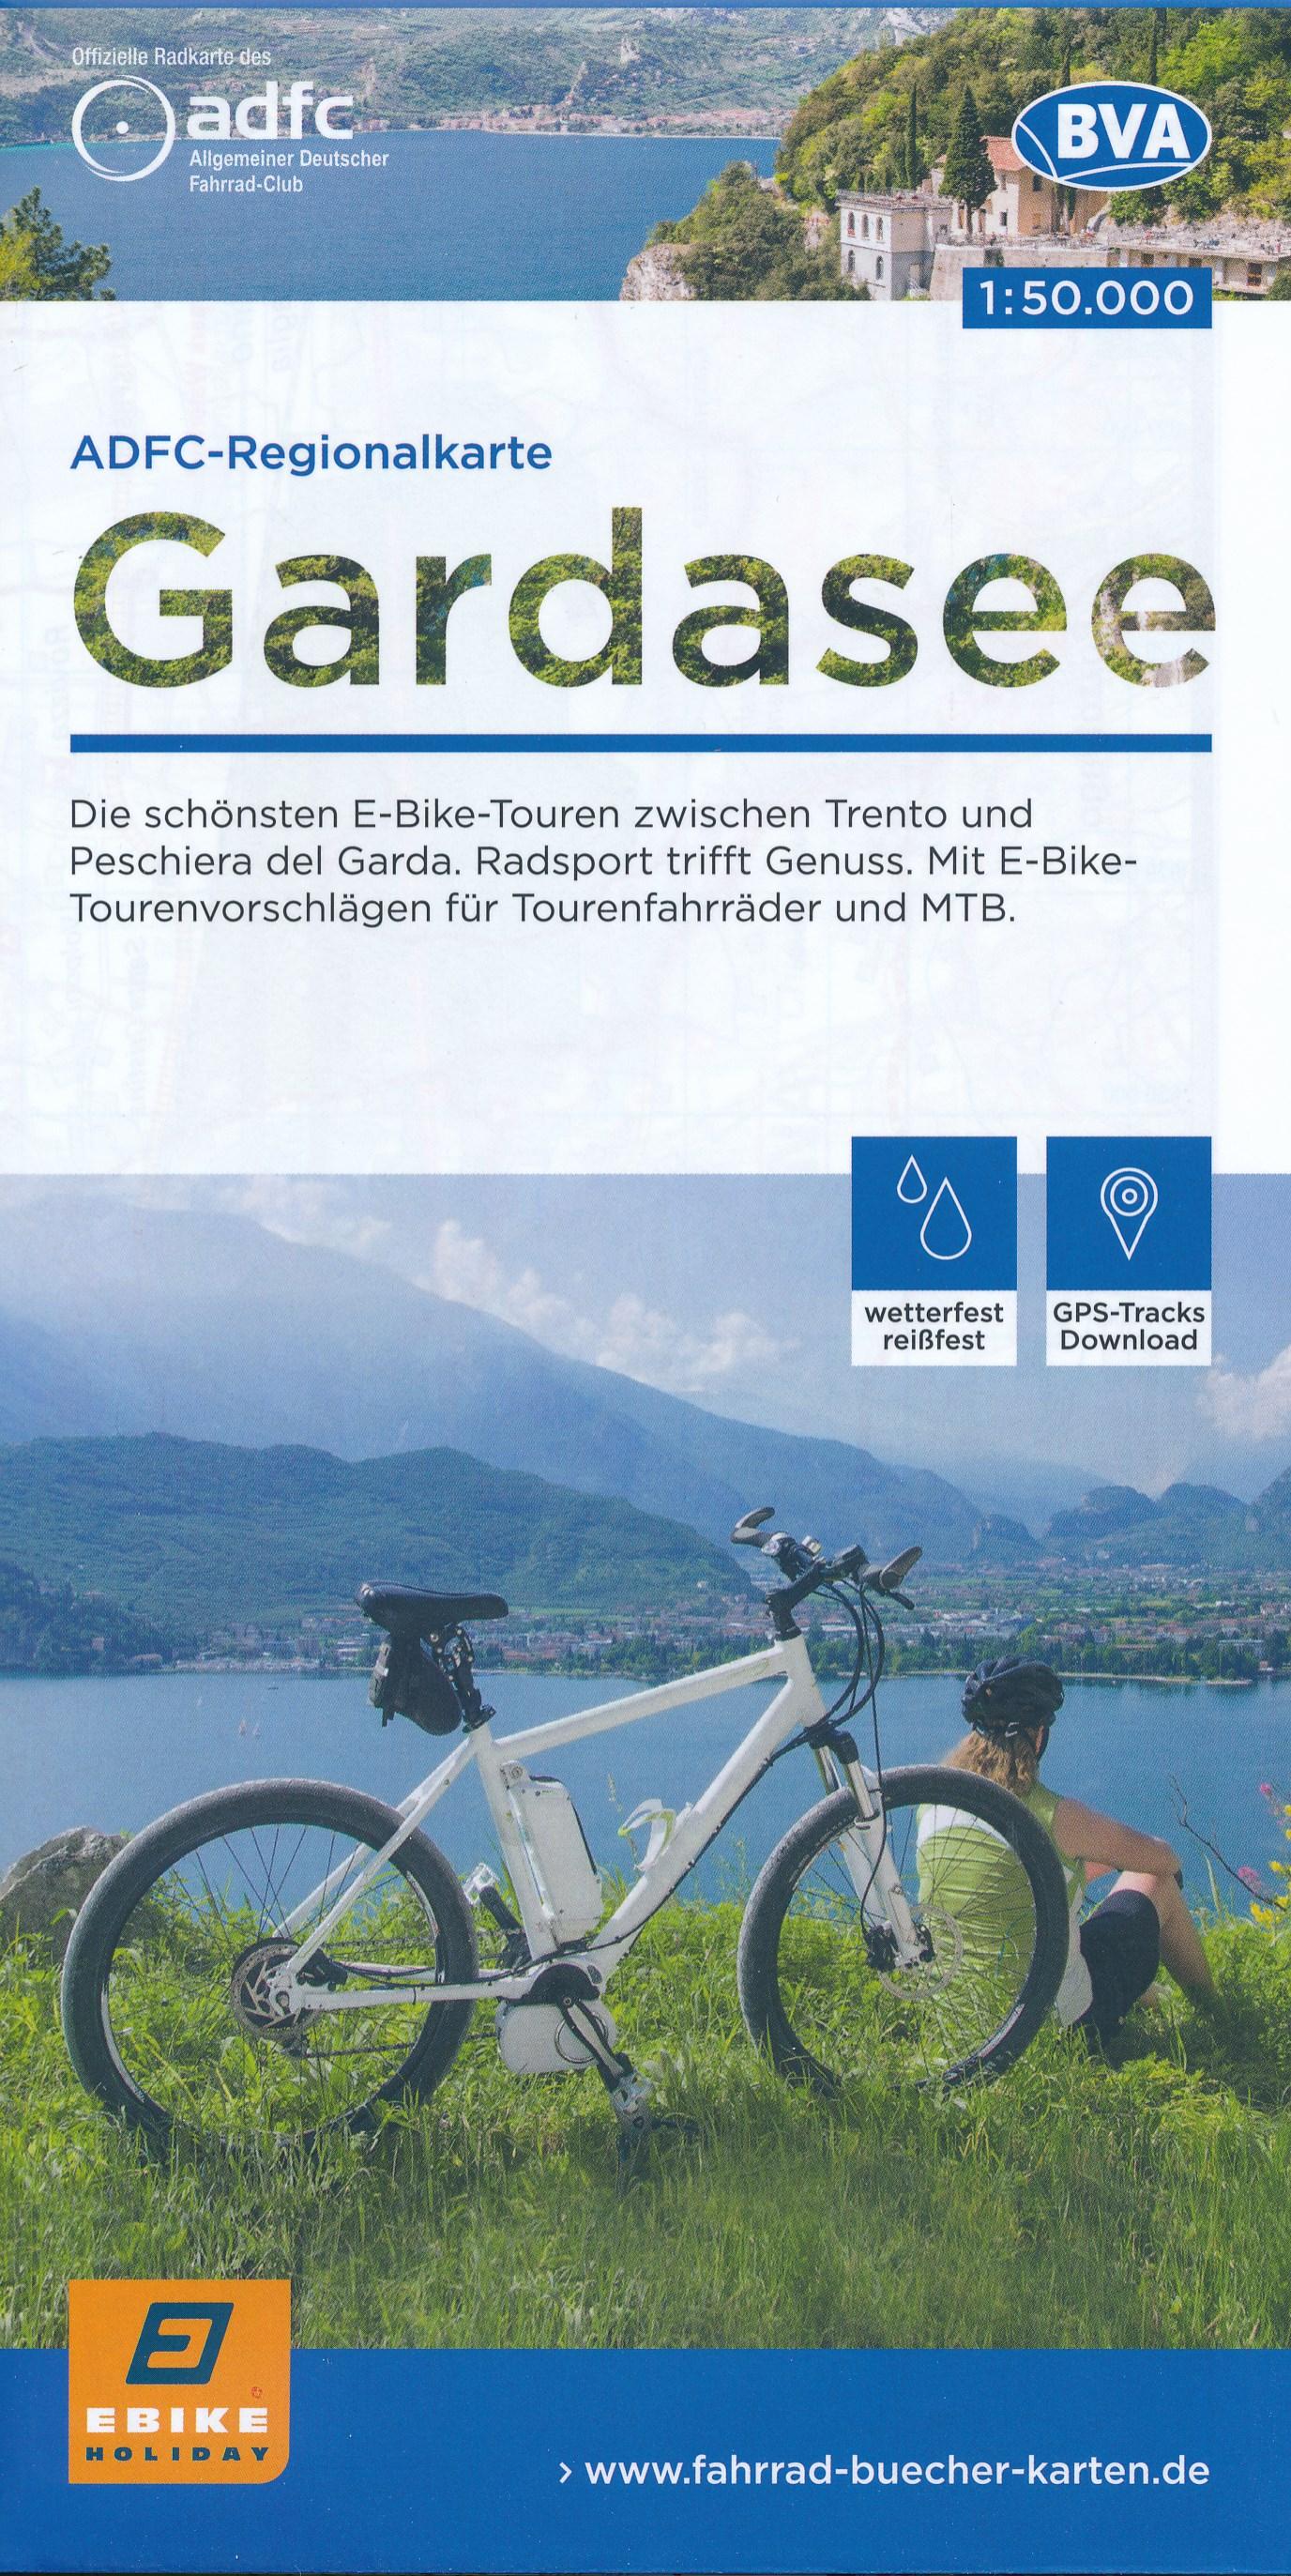 Fietskaart ADFC Regionalkarte Gardasee - ebike | BVA